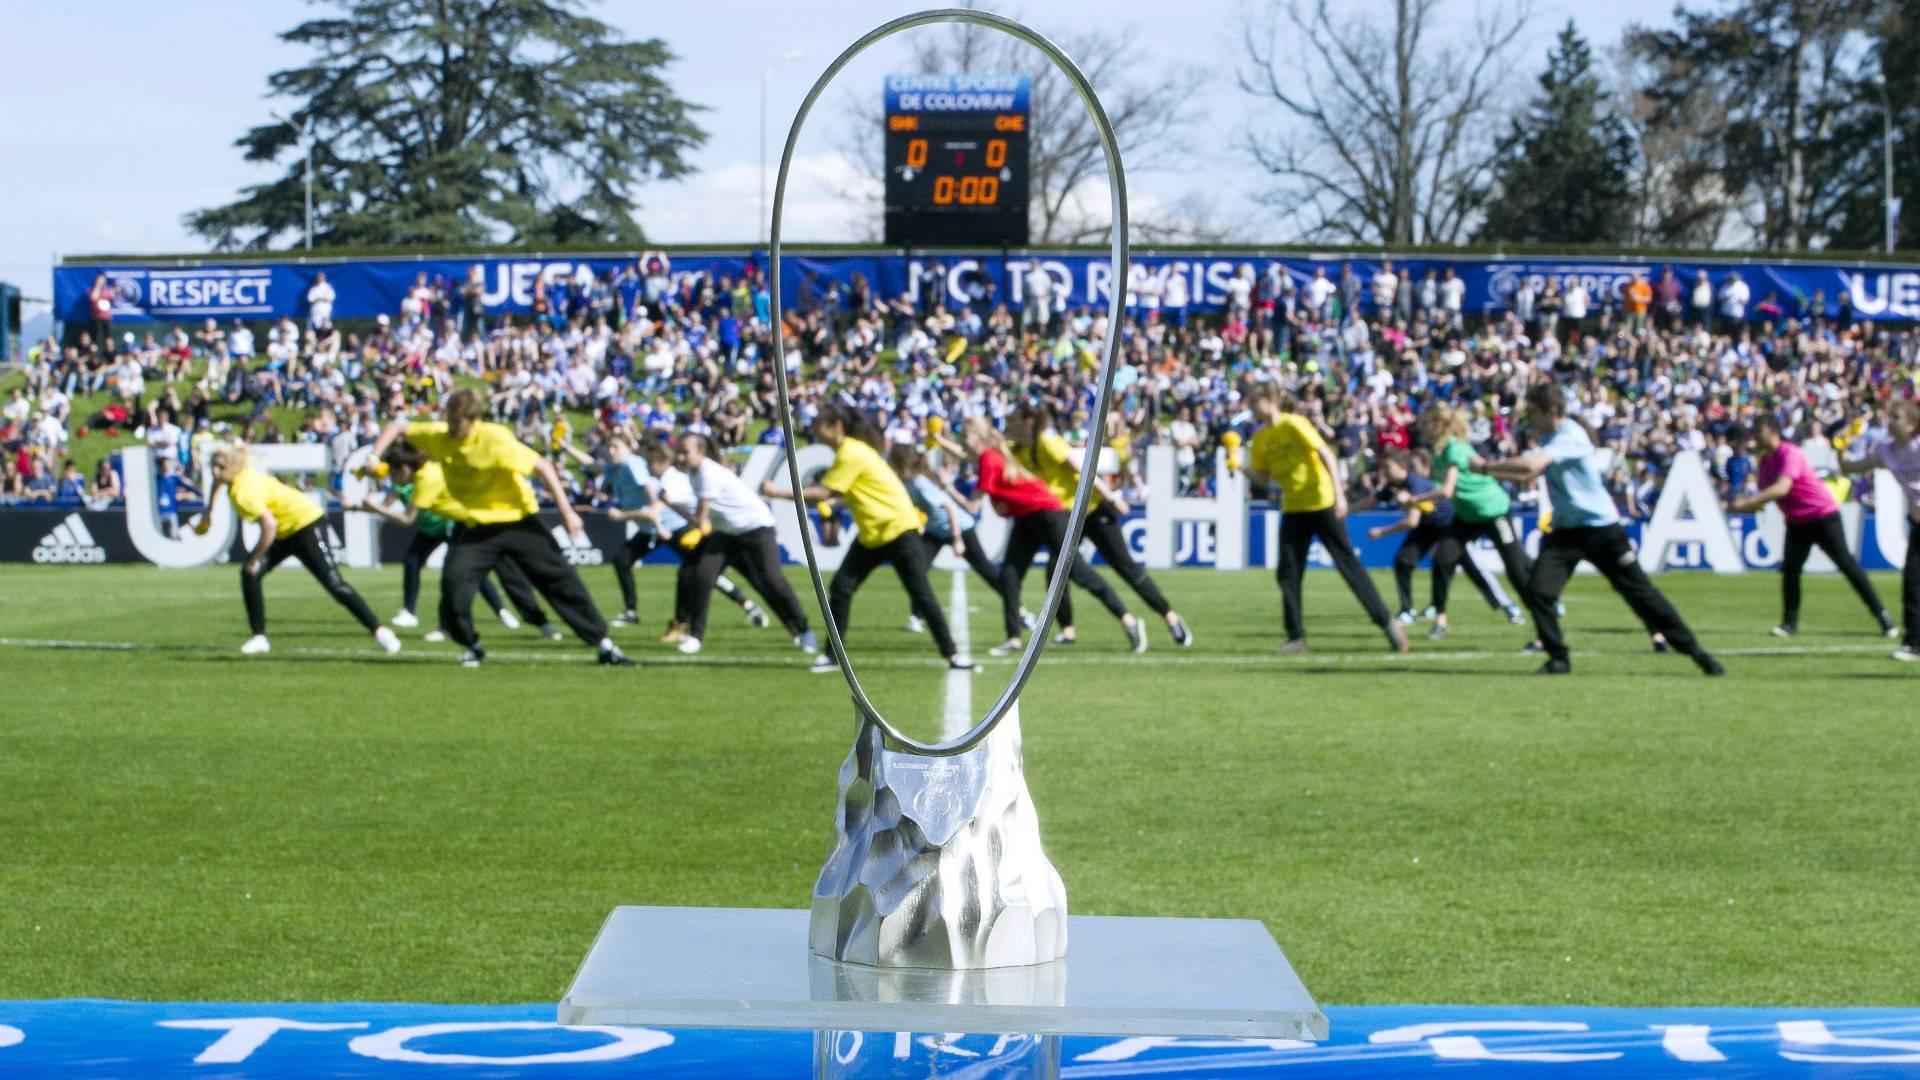 UEFA Youth League, in esclusiva Sky Sport HD le prossime tre edizioni